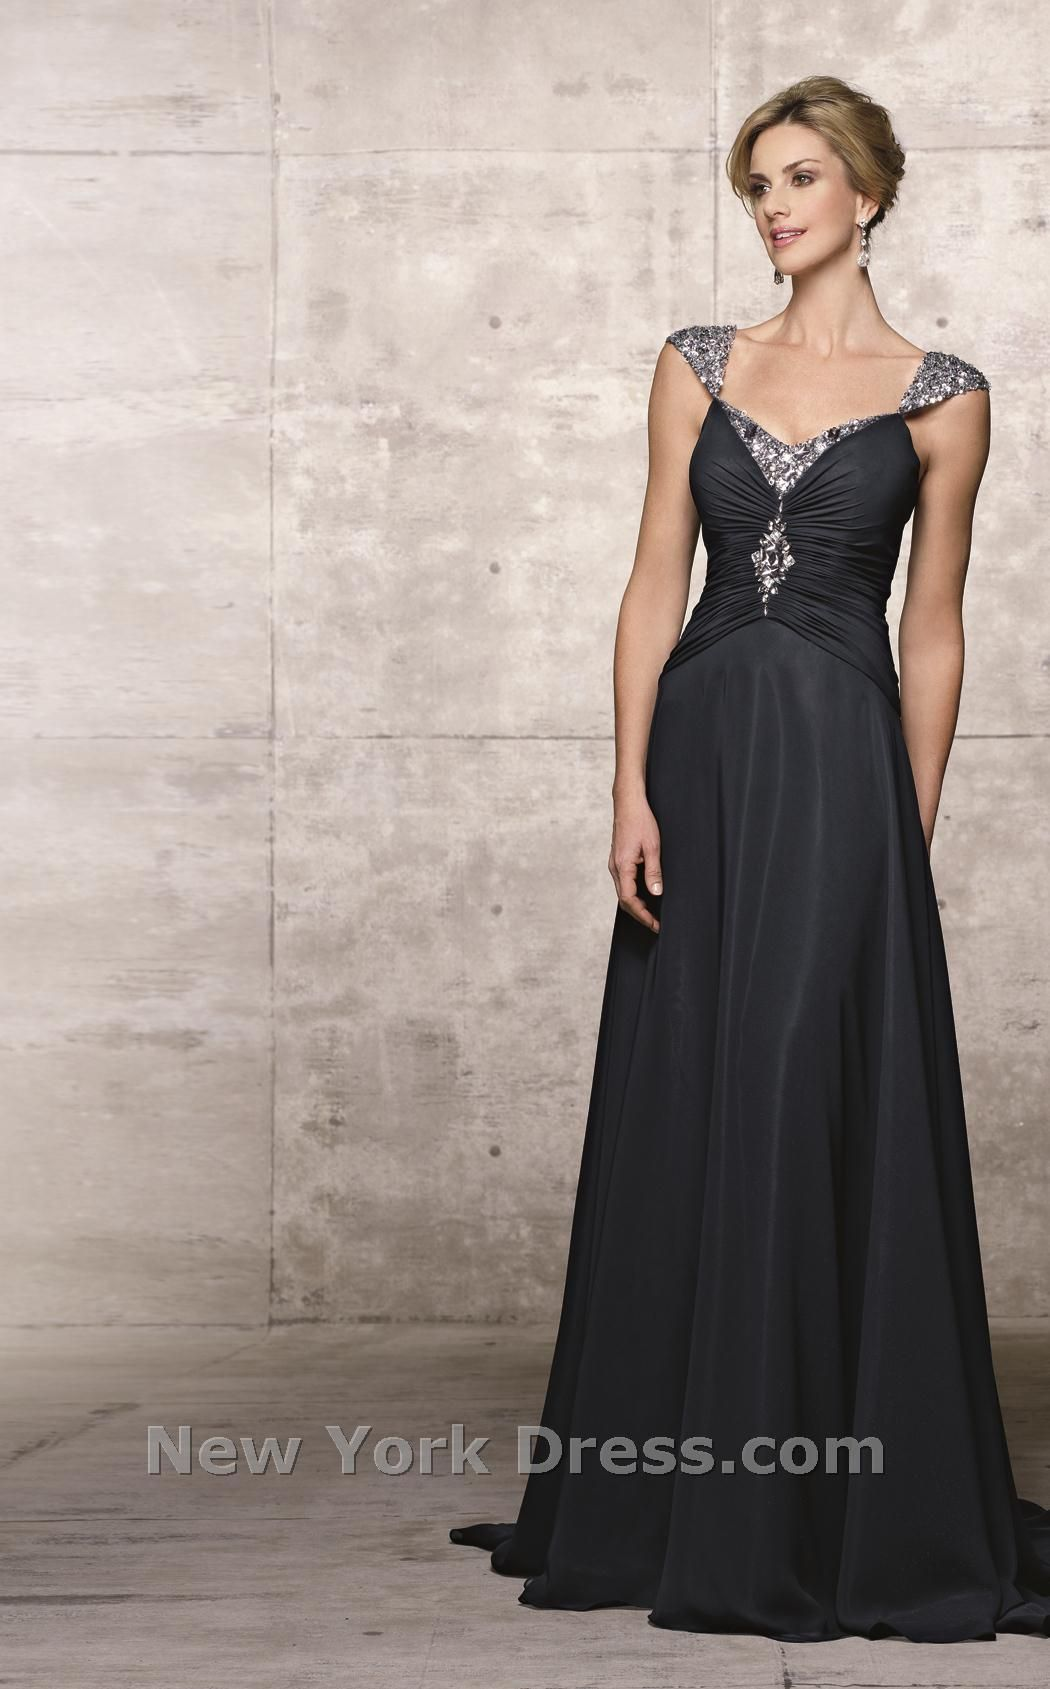 Alyce 29421 dress newyorkdress dresses pinterest fancy alyce 29421 dress newyorkdress ombrellifo Gallery